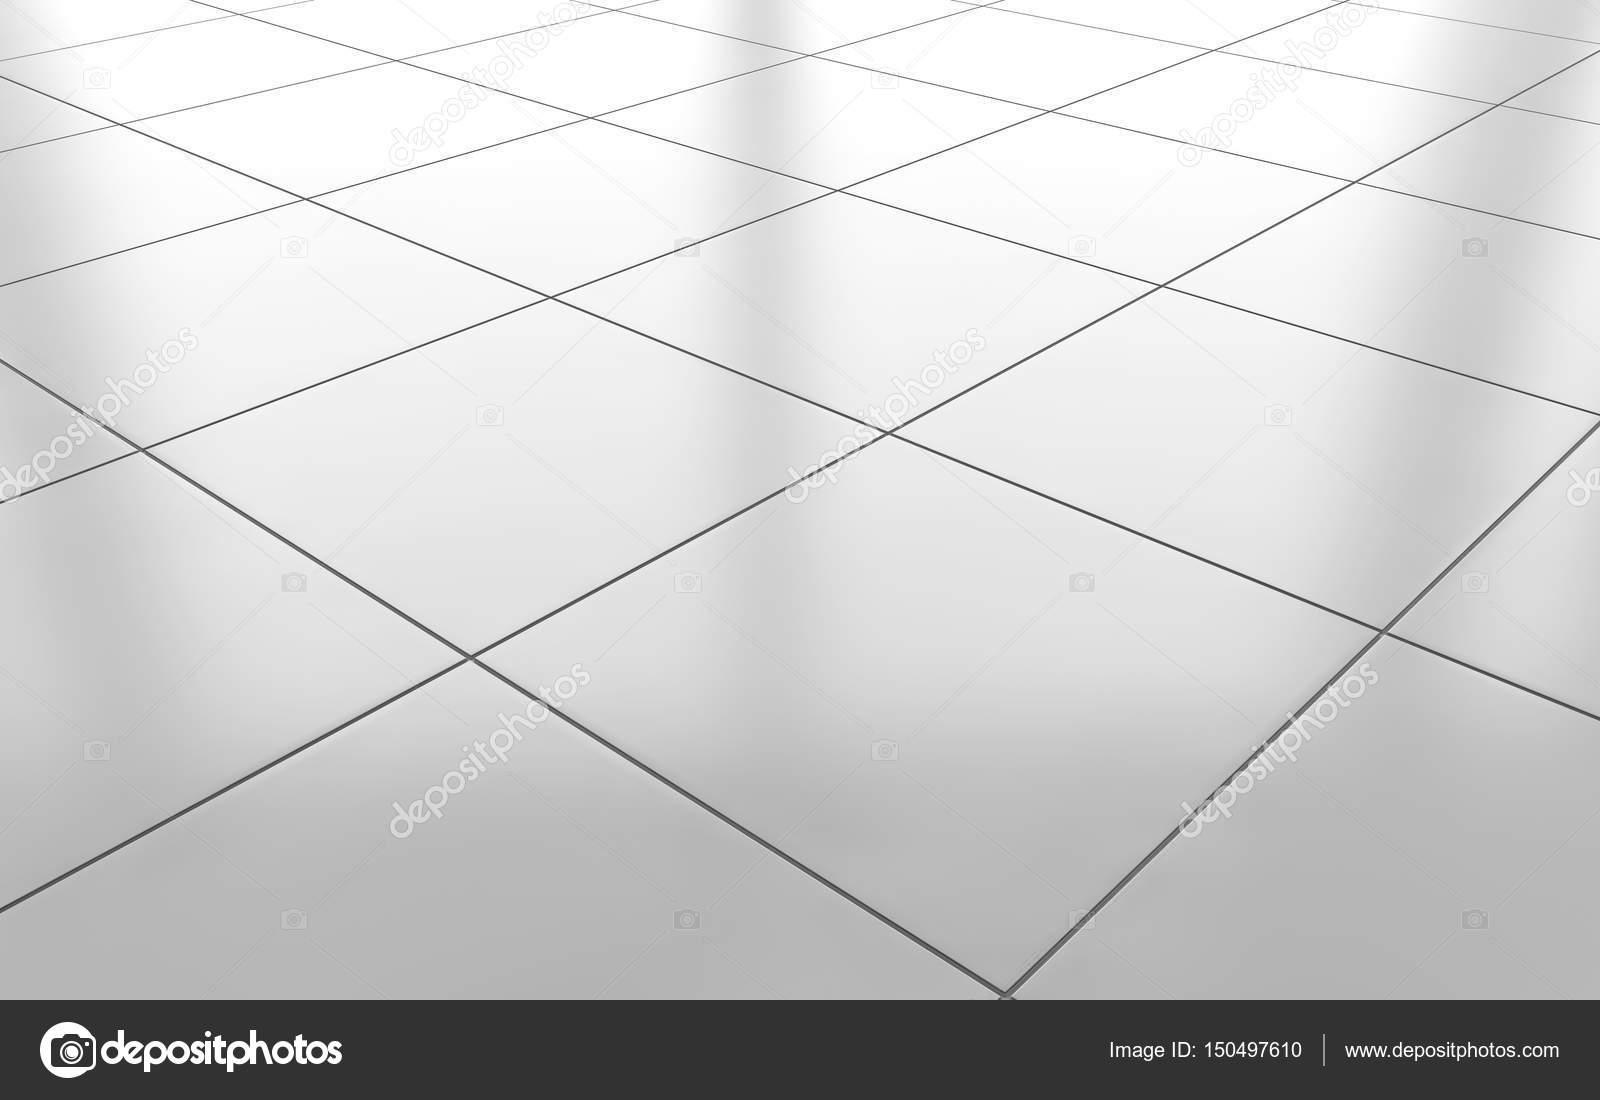 Azulejo De Cer 225 Mica Brillante Blanco Piso Fondo Render 3d